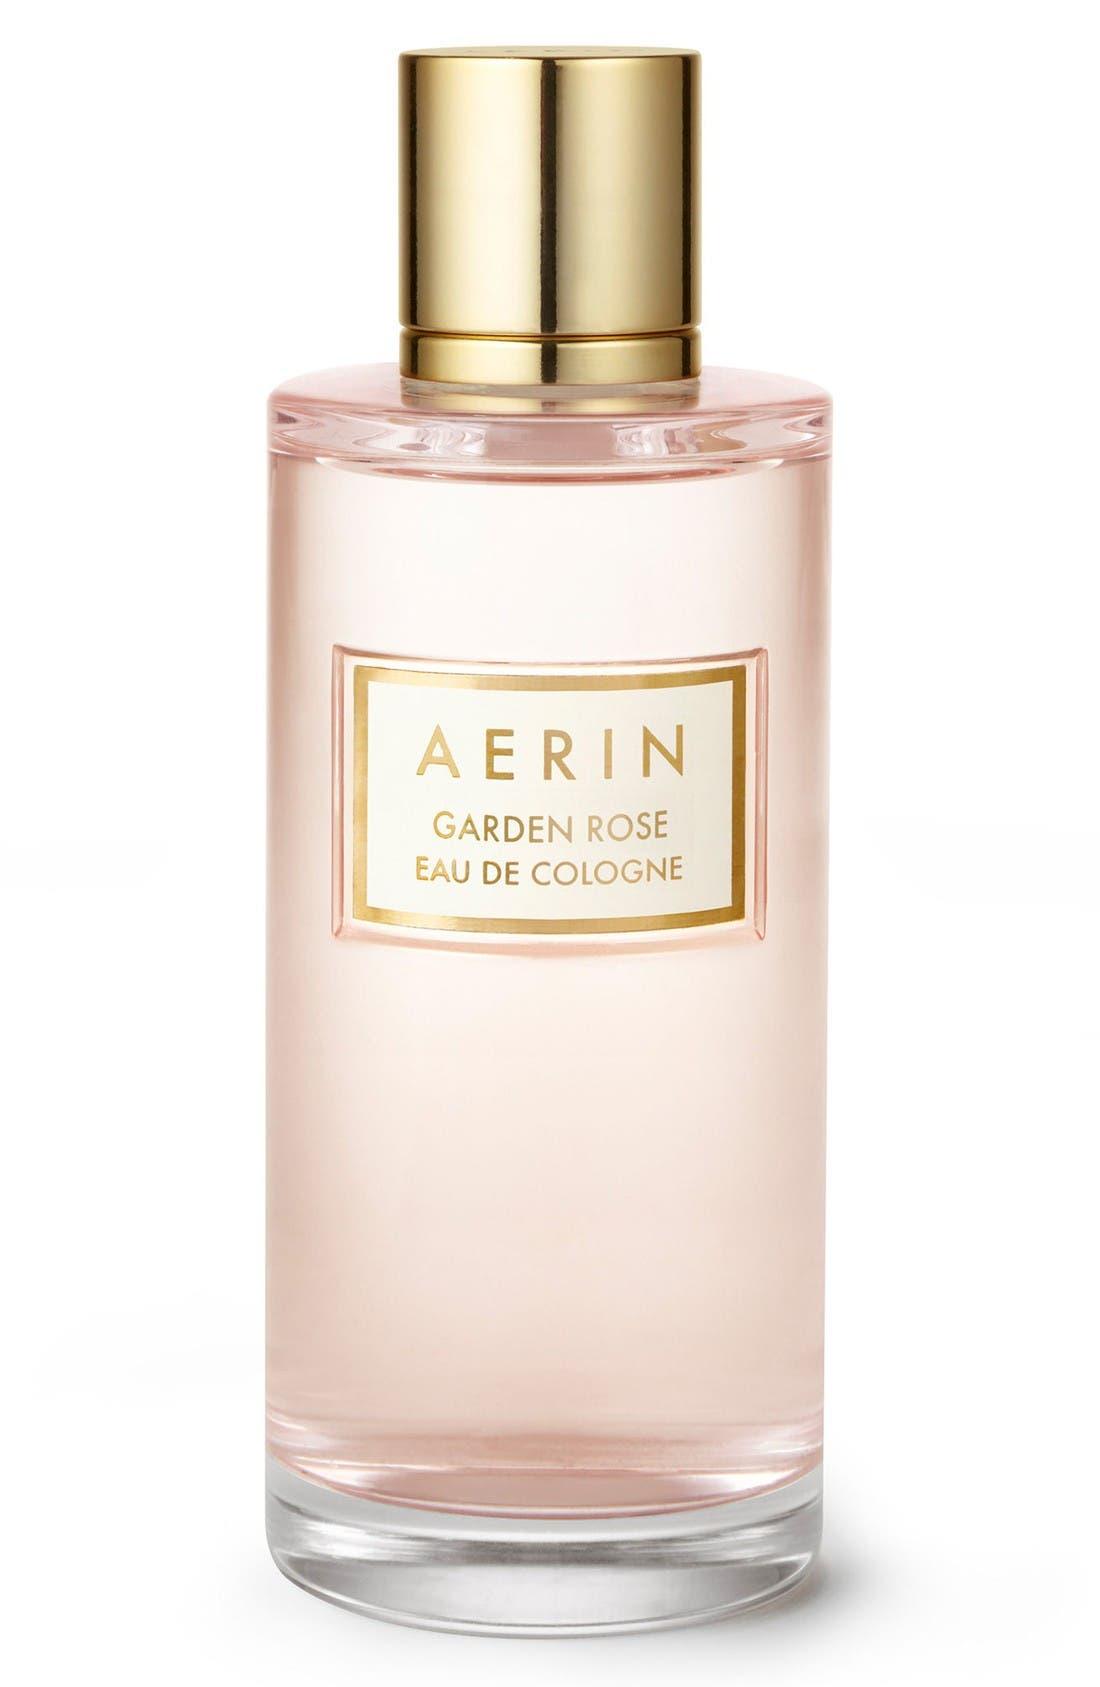 AERIN Beauty Garden Rose Eau de Cologne